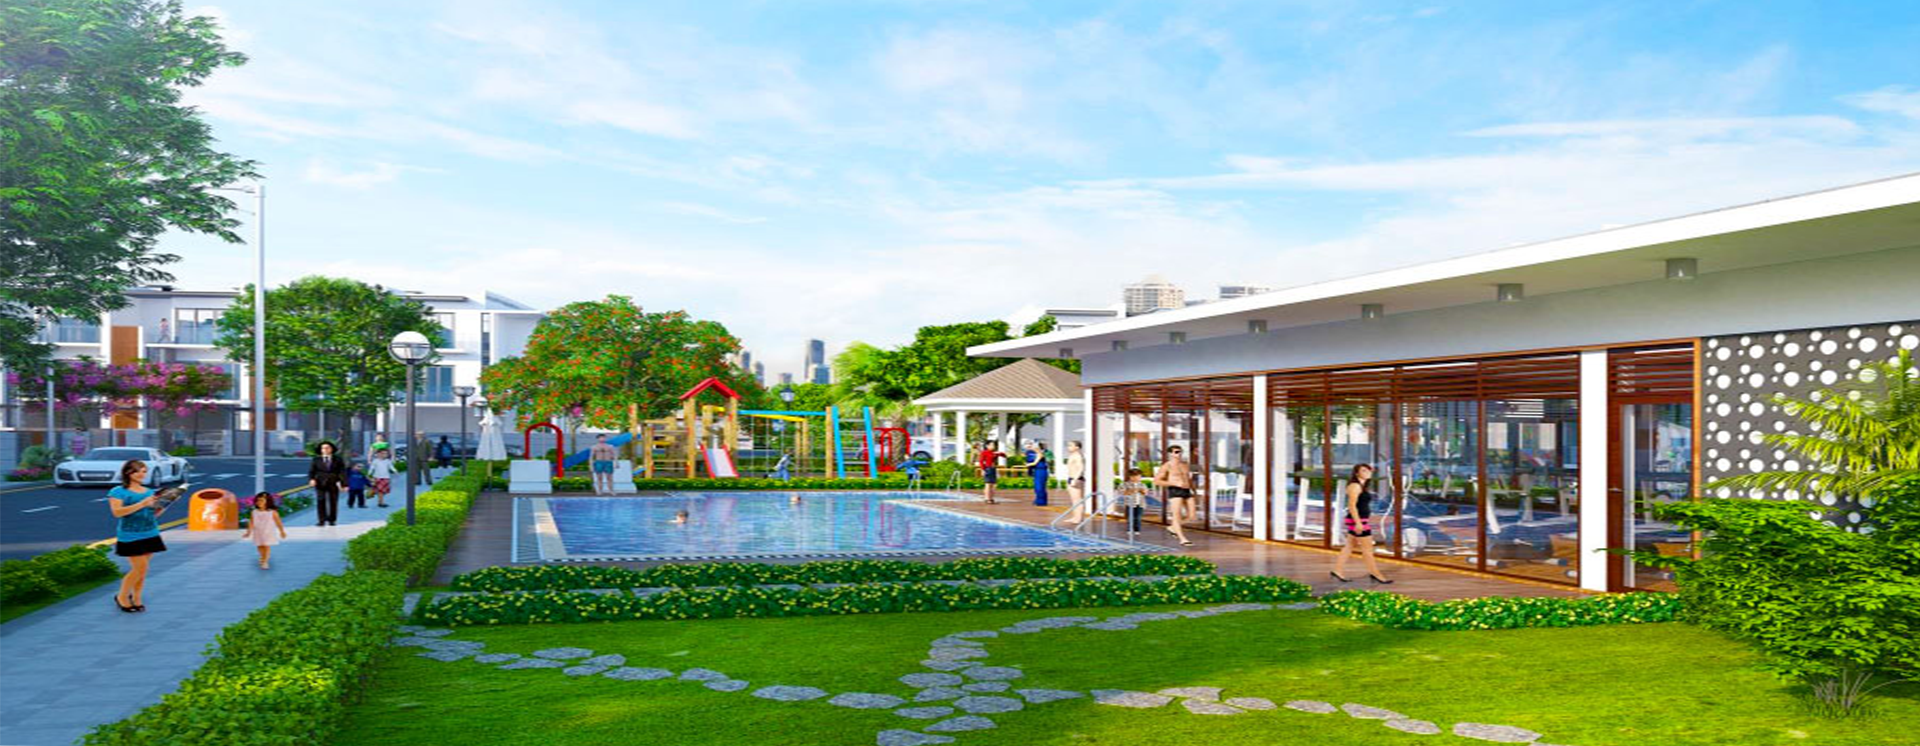 Tiện ích khu dự án Golf Park Novaland